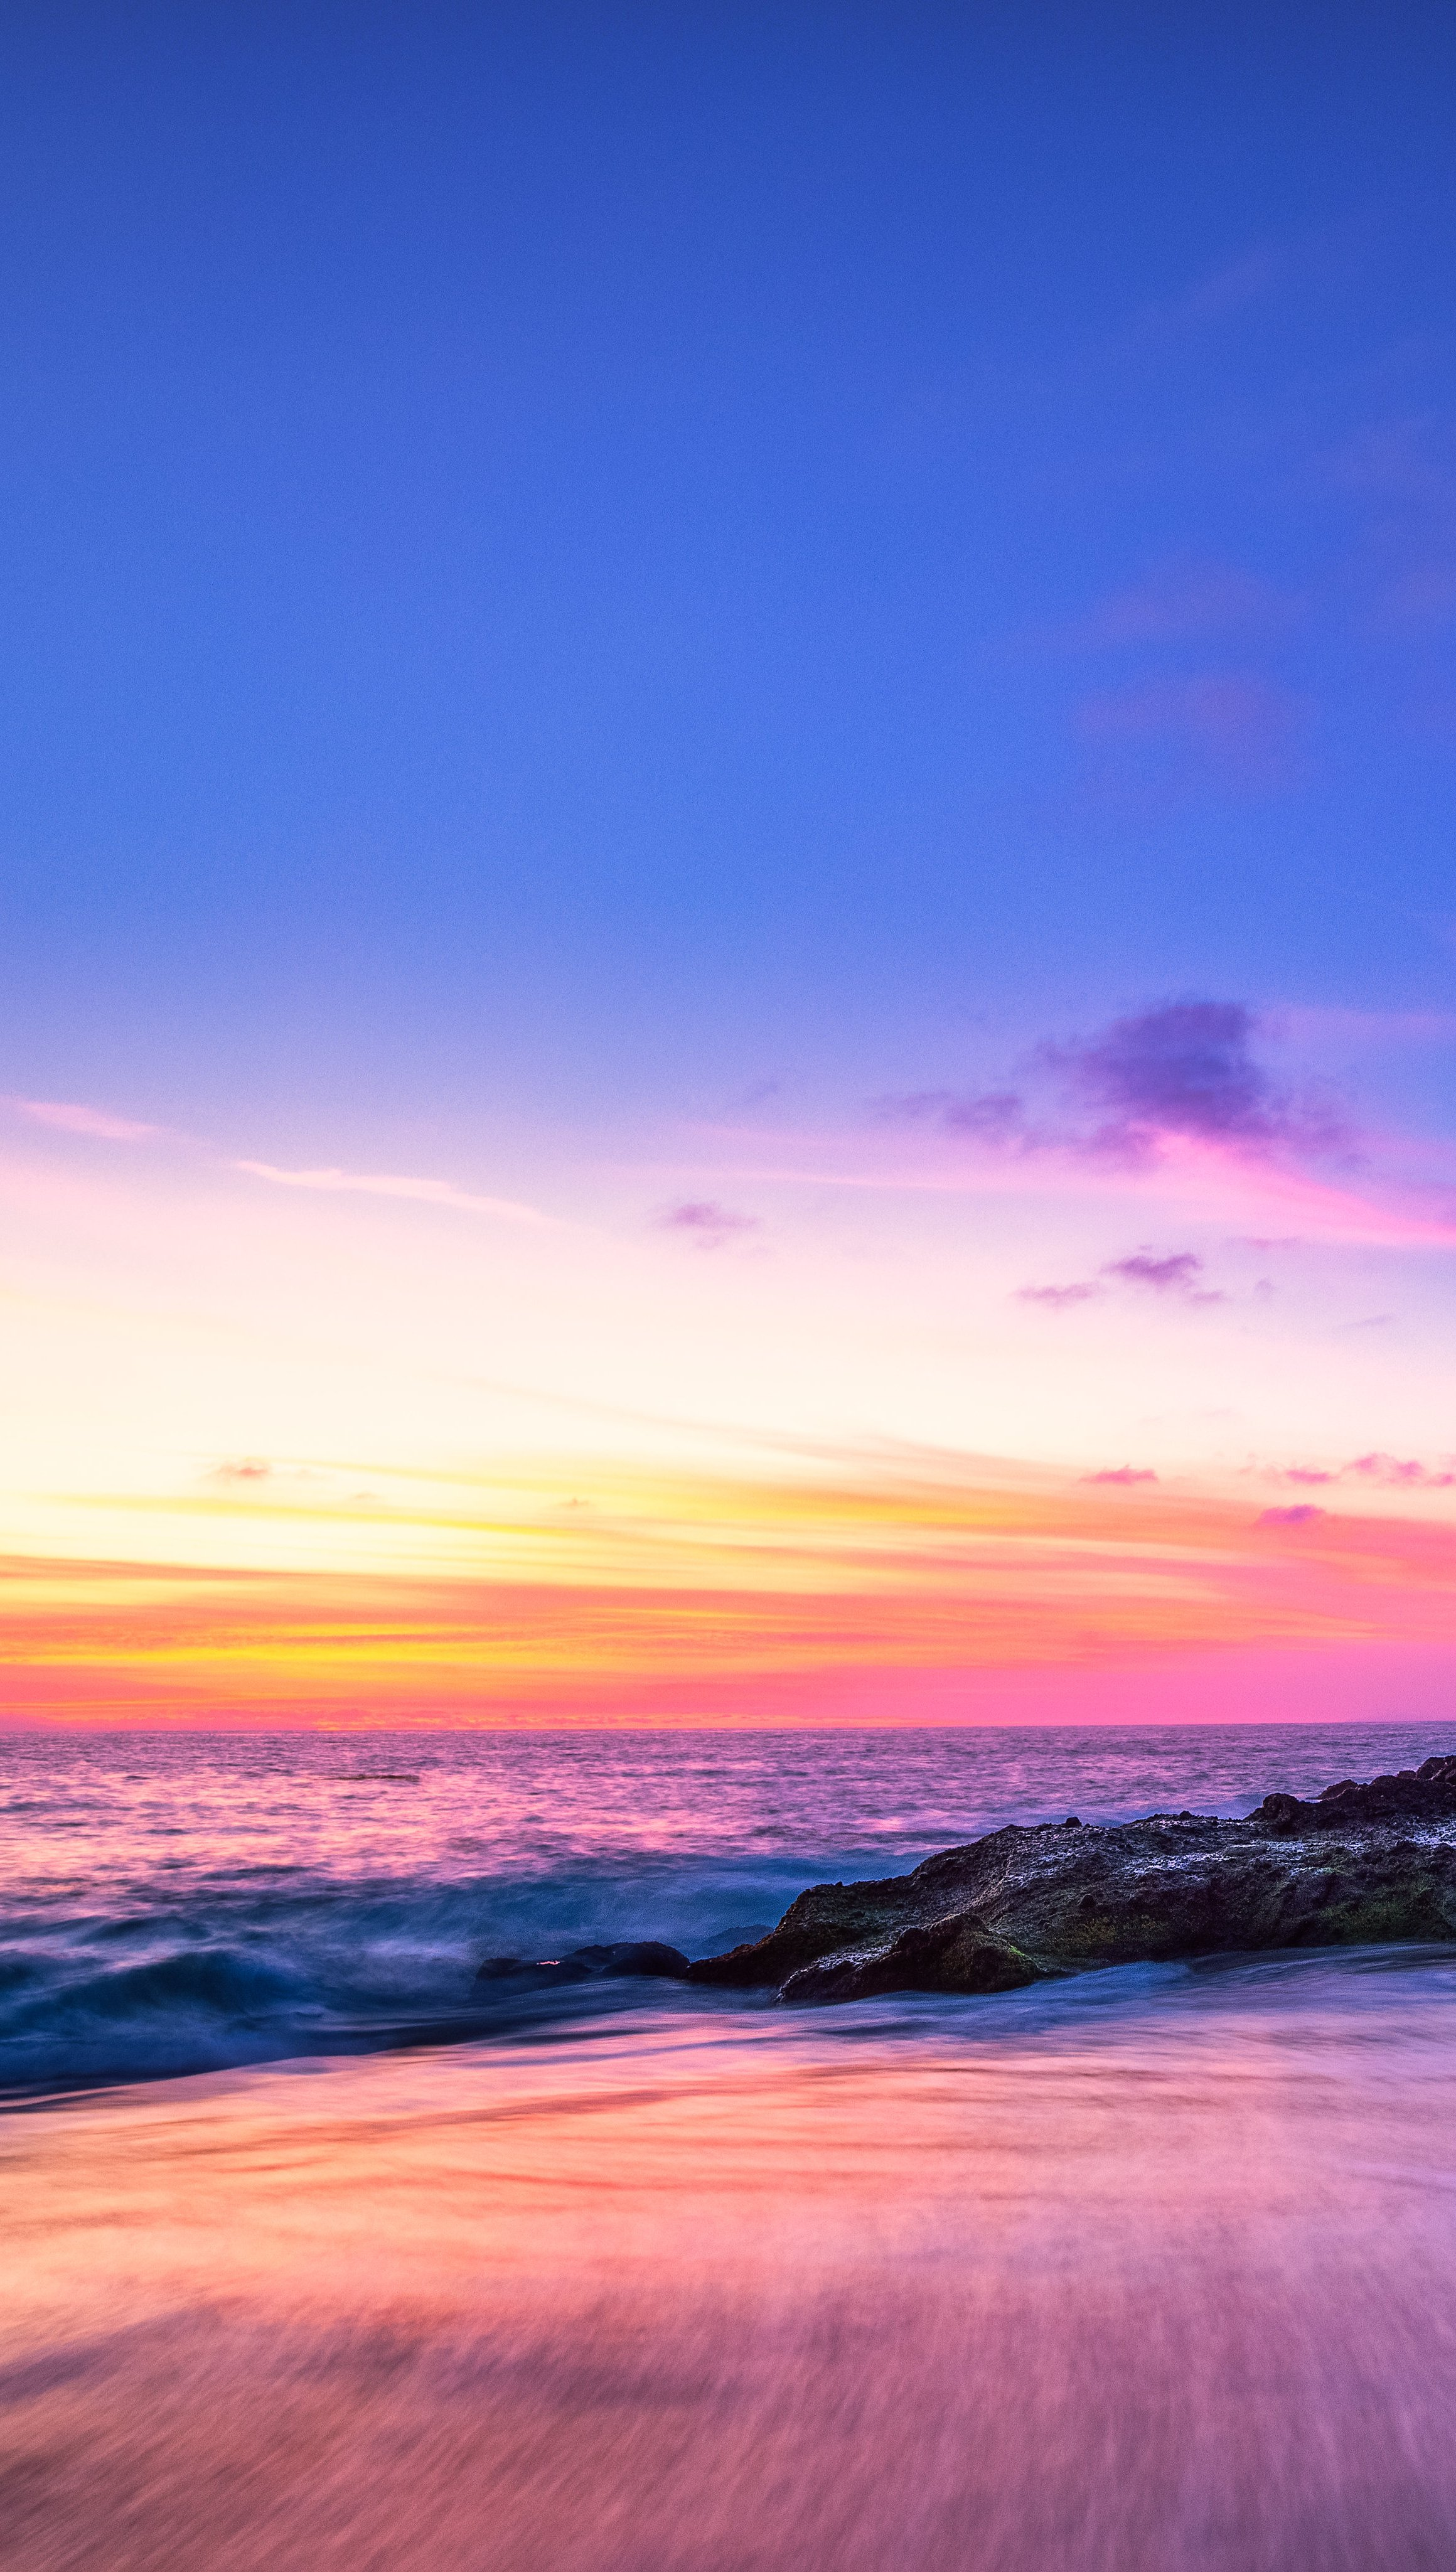 Fondos de pantalla Playa Laguna al atardecer Vertical